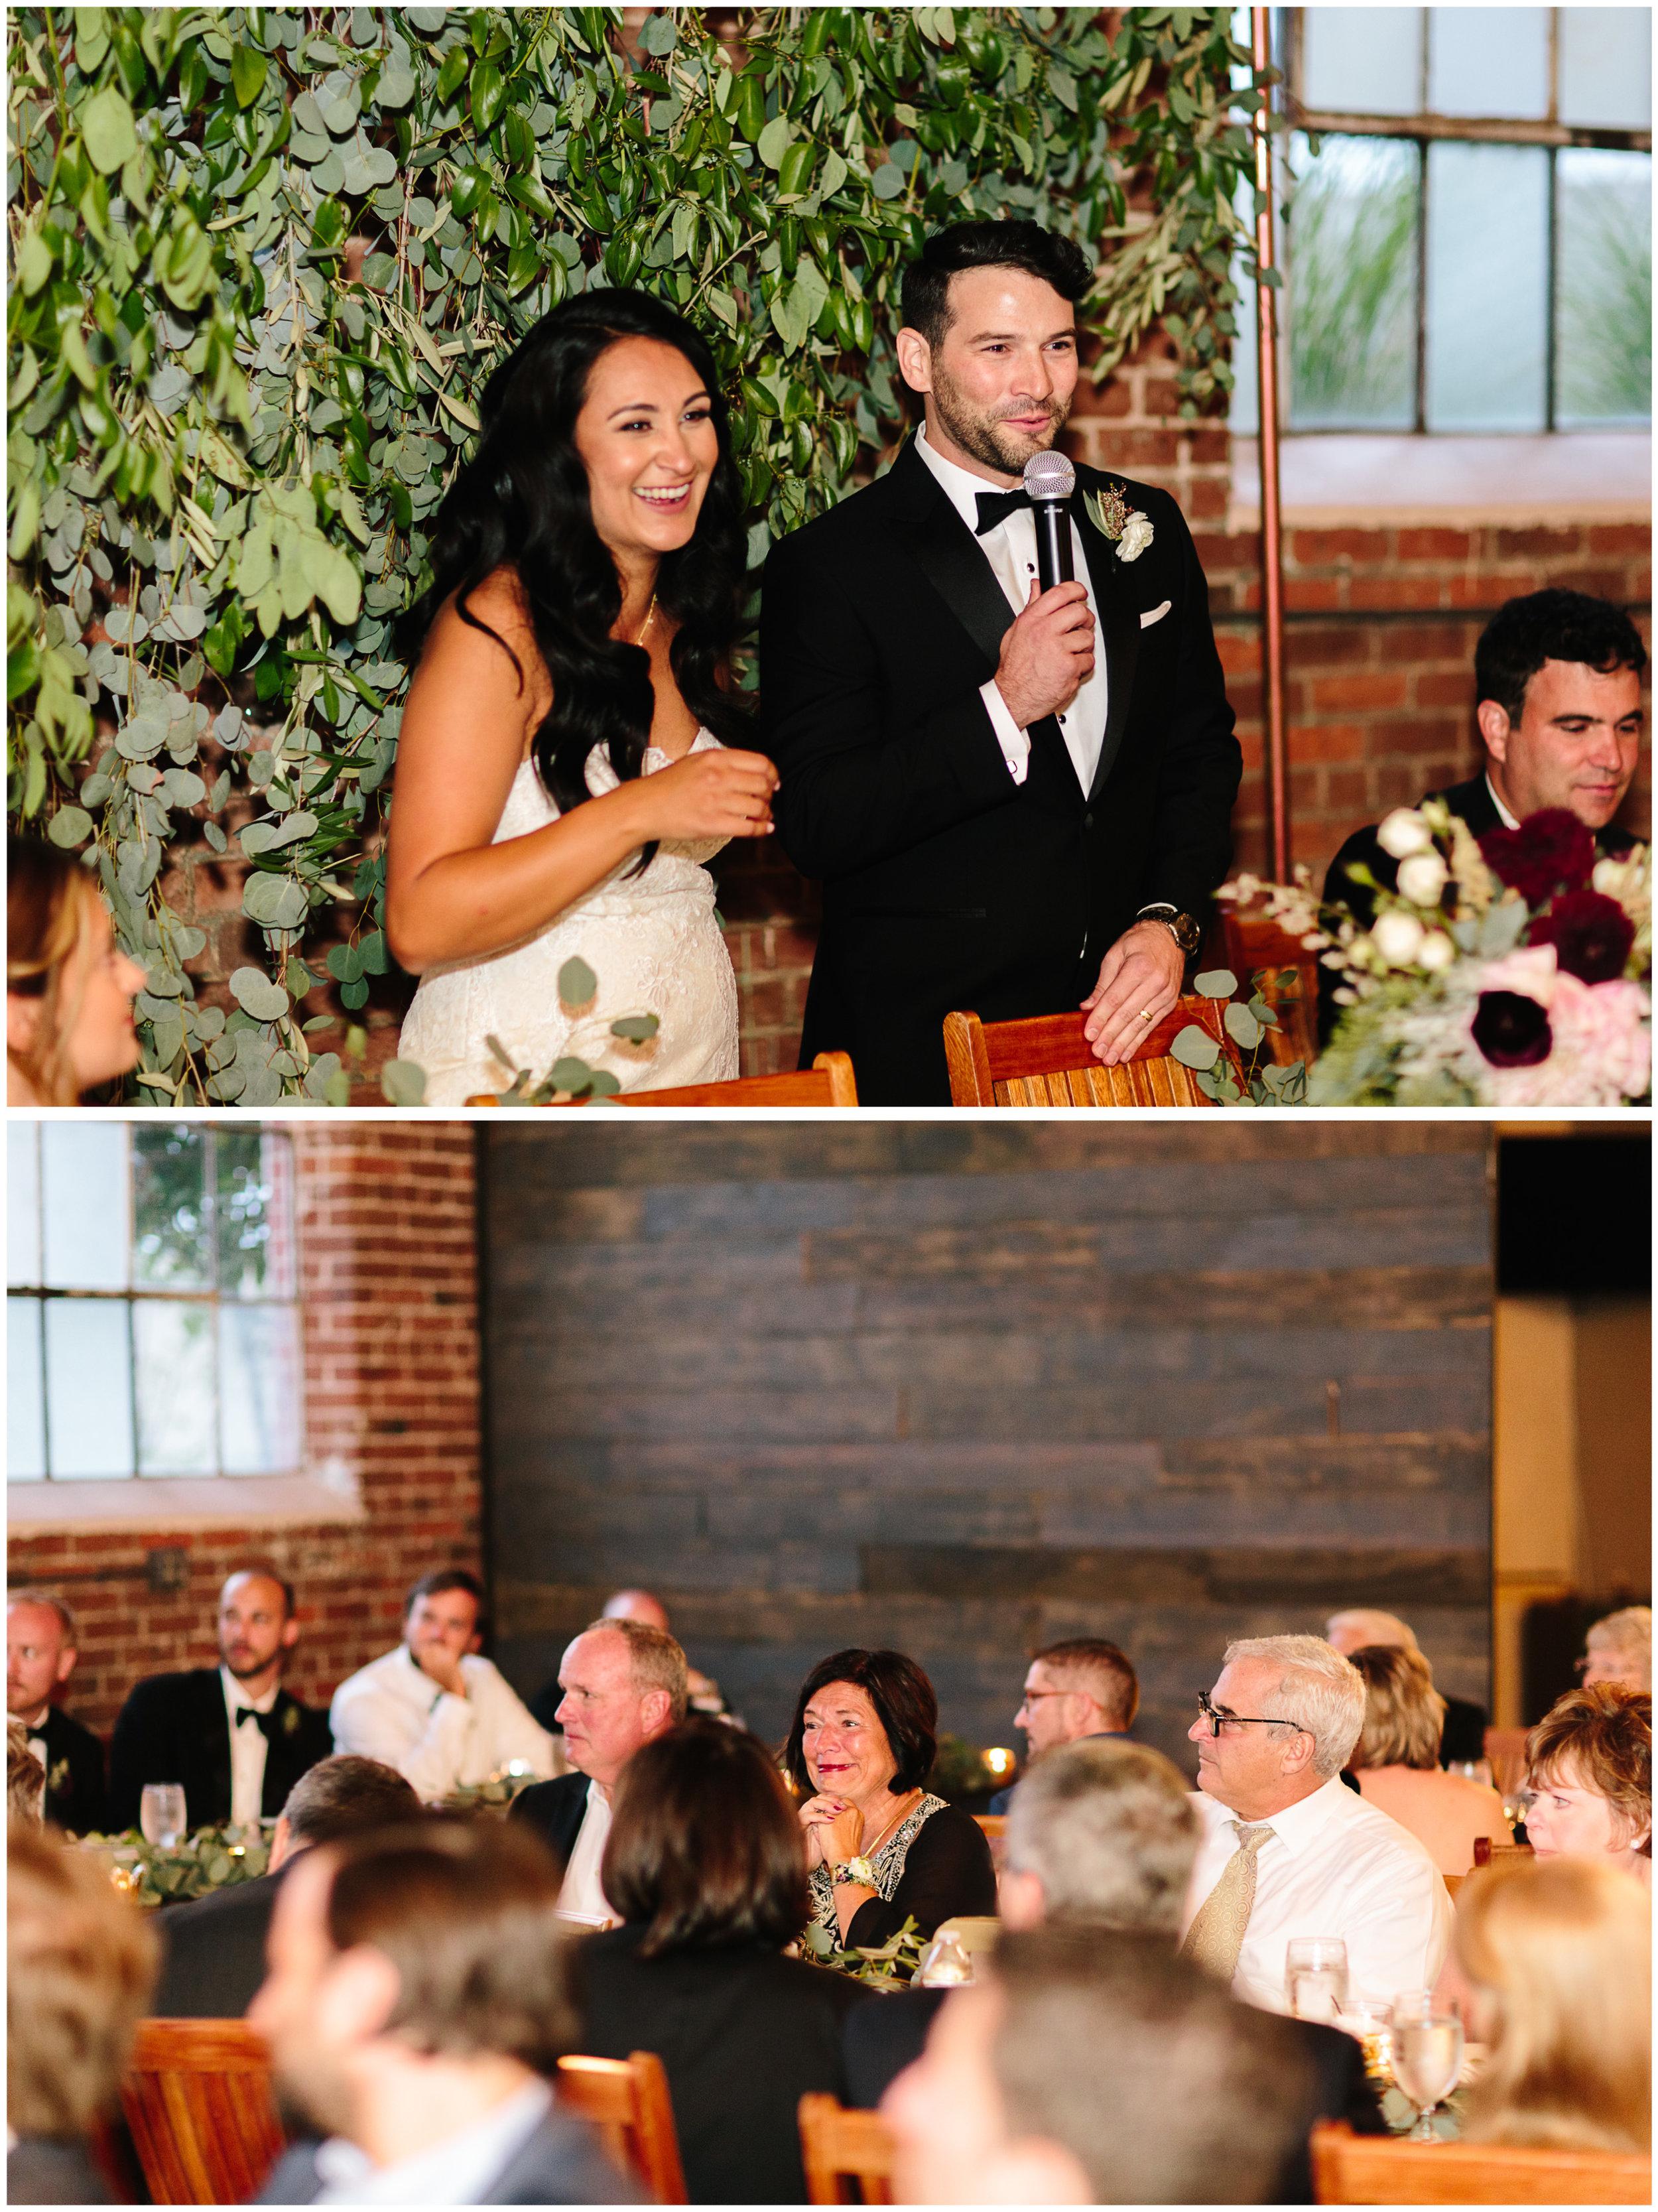 moss_denver_wedding_62.jpg